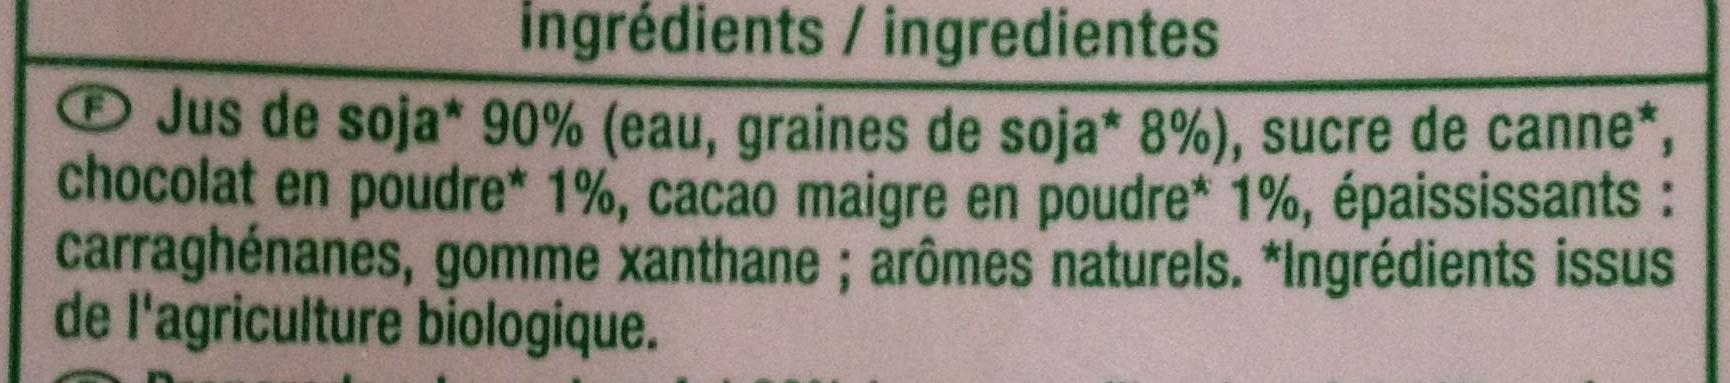 Boisson au soja saveur chocolat - Ingredients